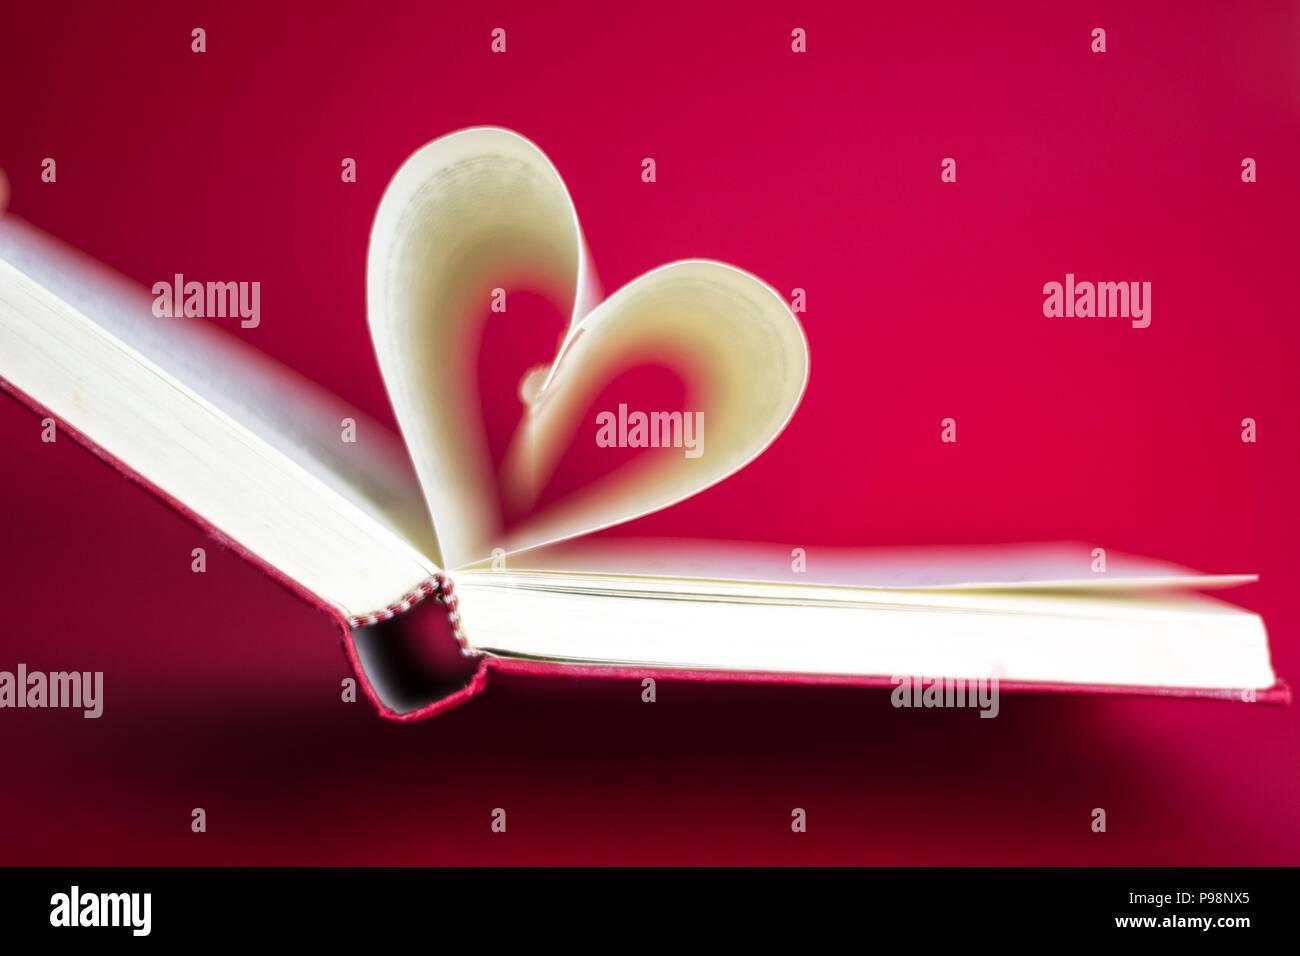 Book Bookcover Love Heartshape Romance Cute Background Red White - Stock Image